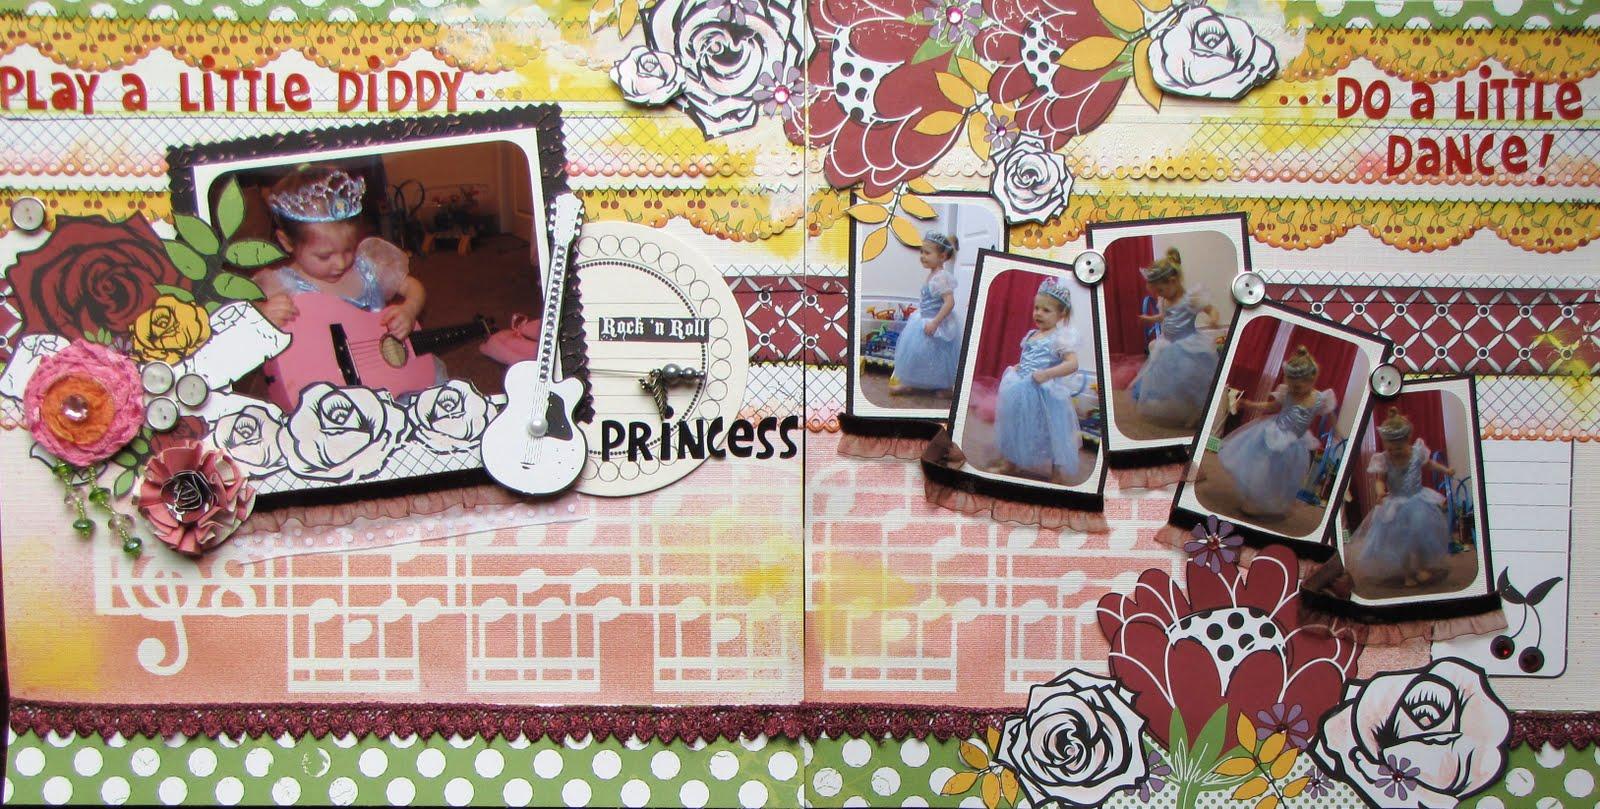 http://4.bp.blogspot.com/_QR7SpwppMUk/TAKUItLJgzI/AAAAAAAAA6A/UmGHNw-t6Sg/s1600/Rock+%27n+Roll+Princess+by+Carole+Stirrat.JPG